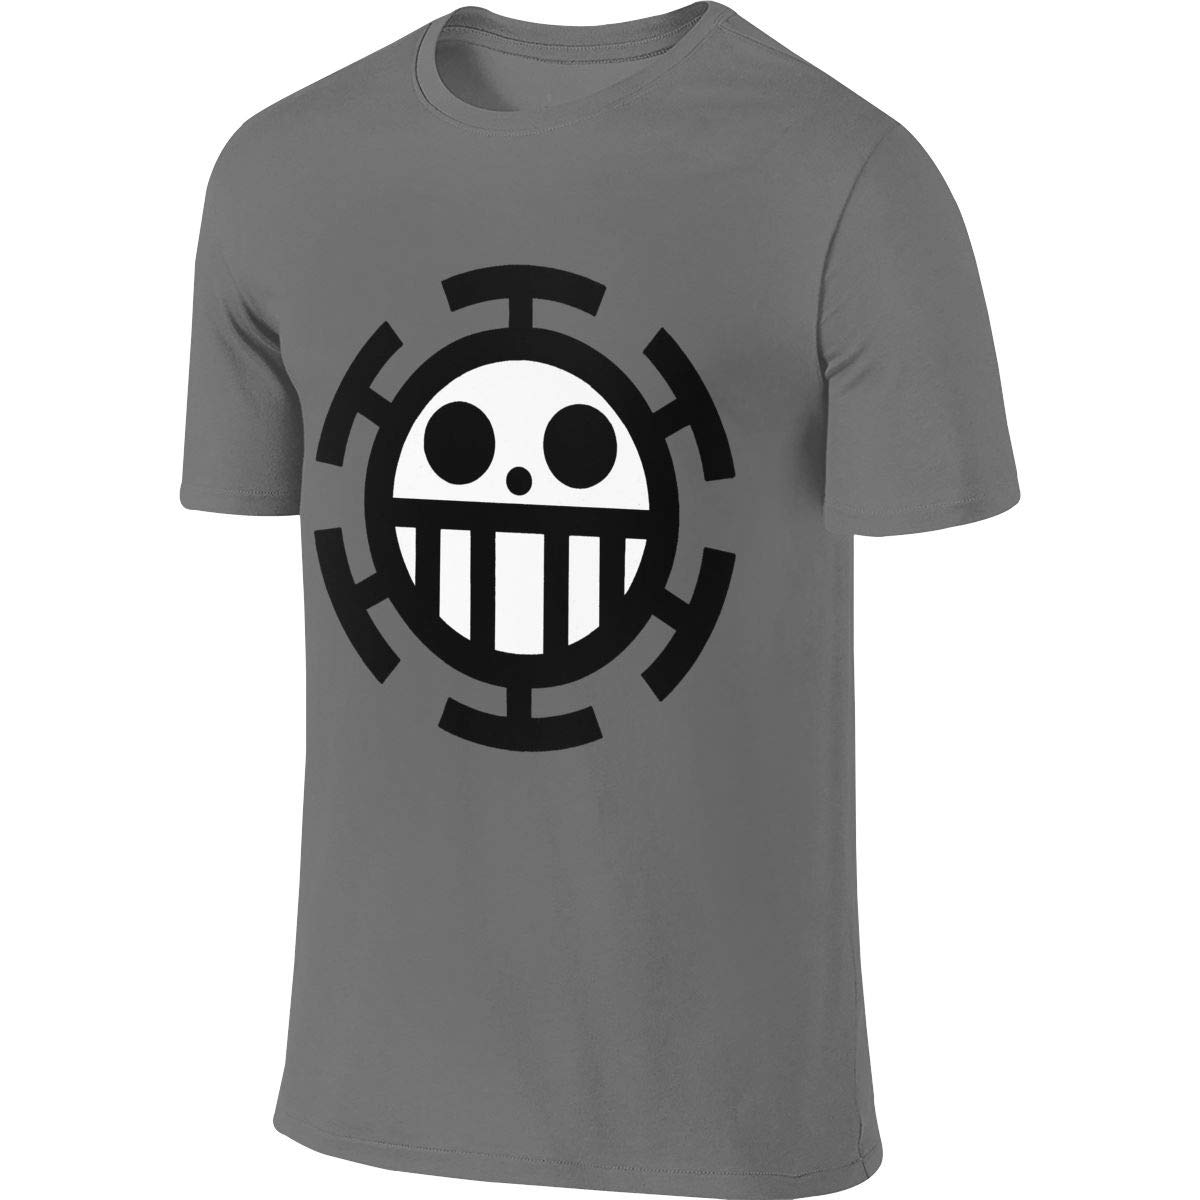 JUDSON Man Custom Humor Tees One Piece Heart Pirates Flag Logo T Shirts